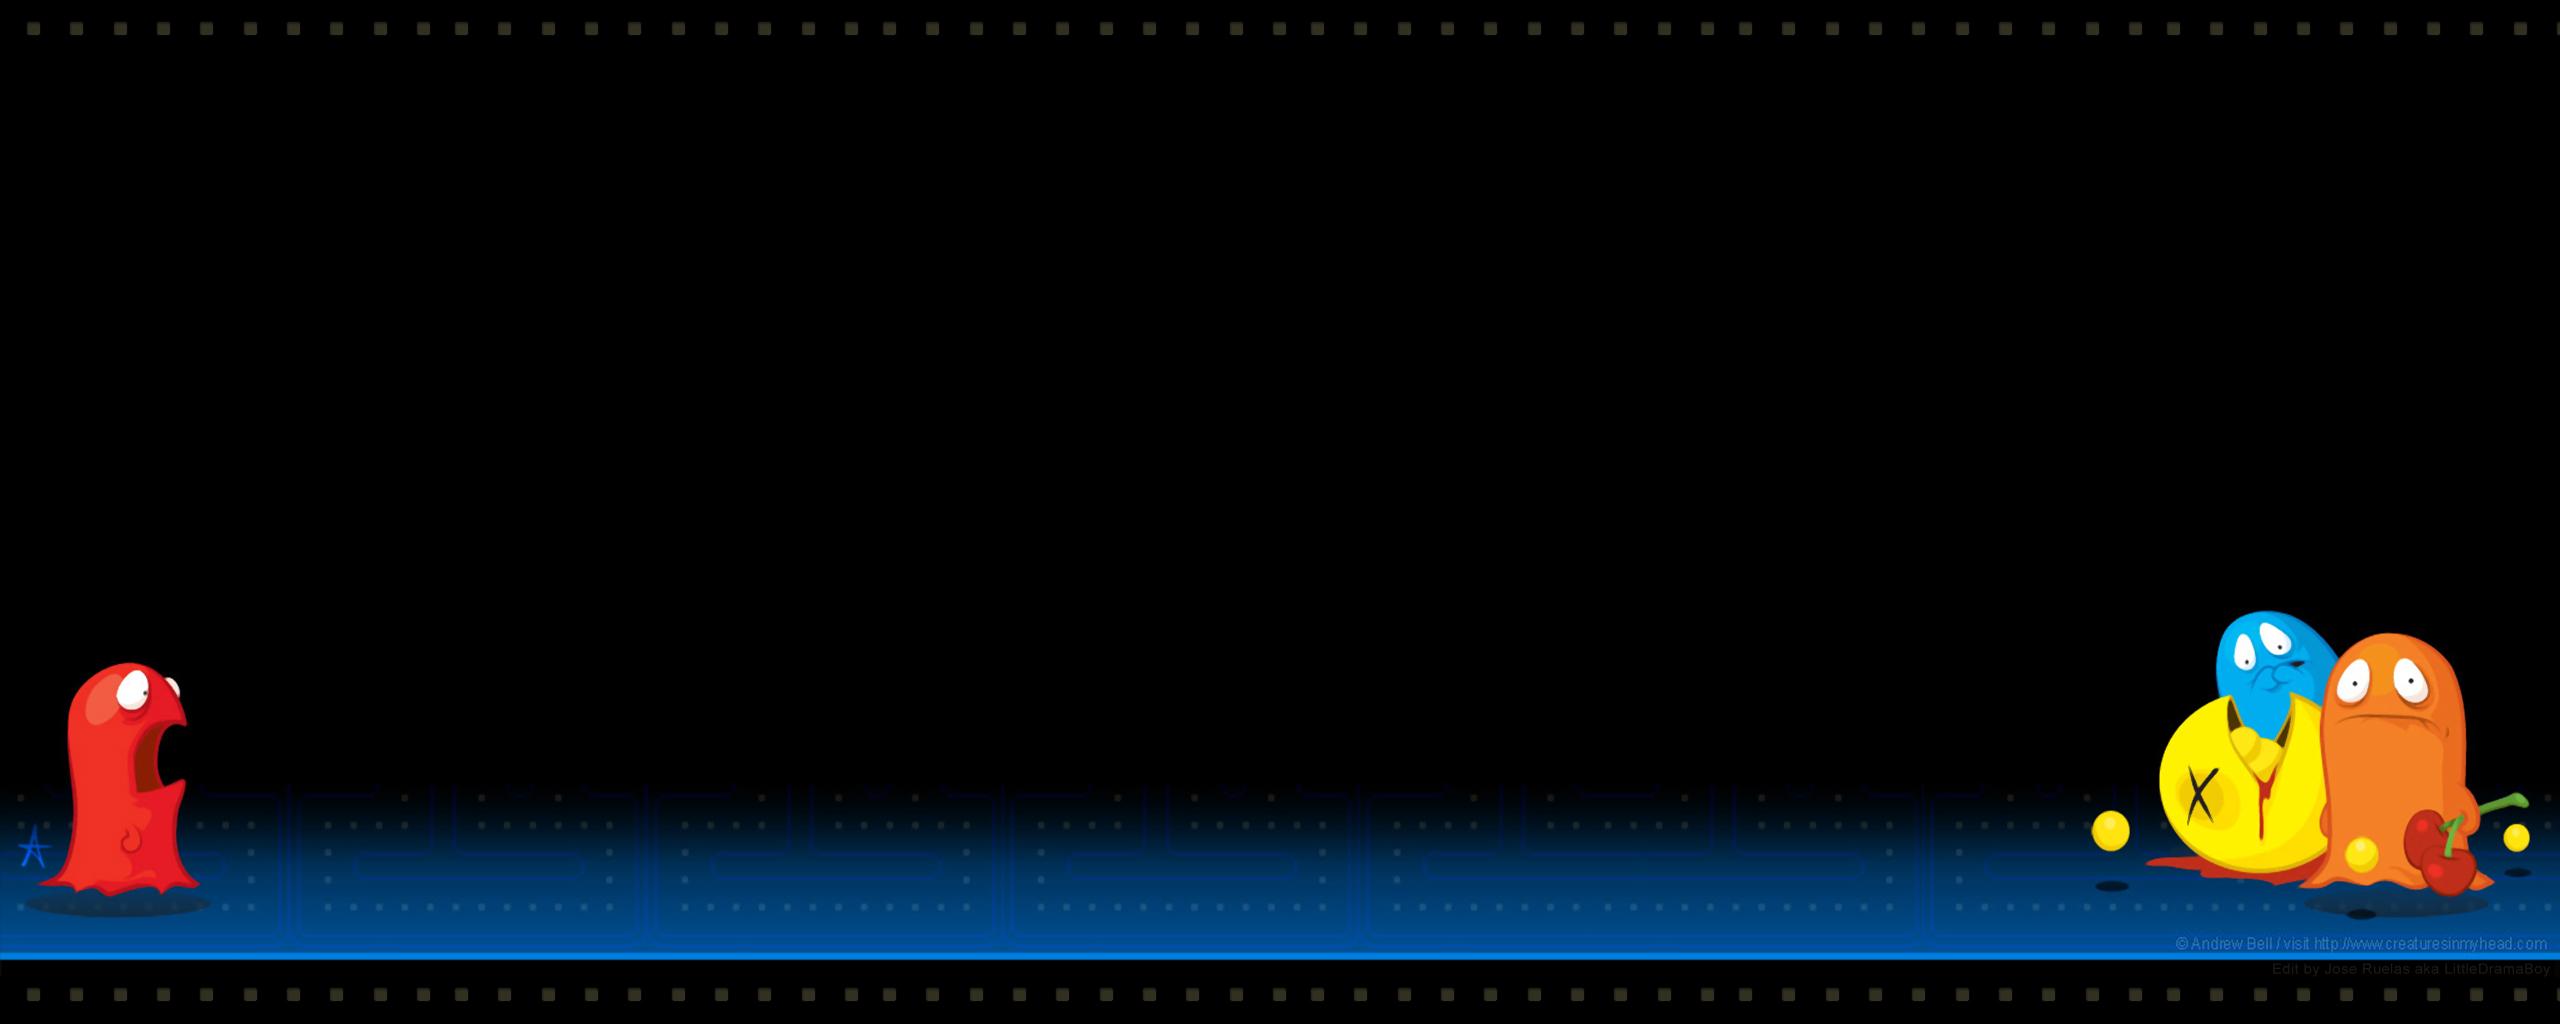 Multi Monitor Video Game Wallpaper 2560x1024 Multi Monitor Video Game 2560x1024